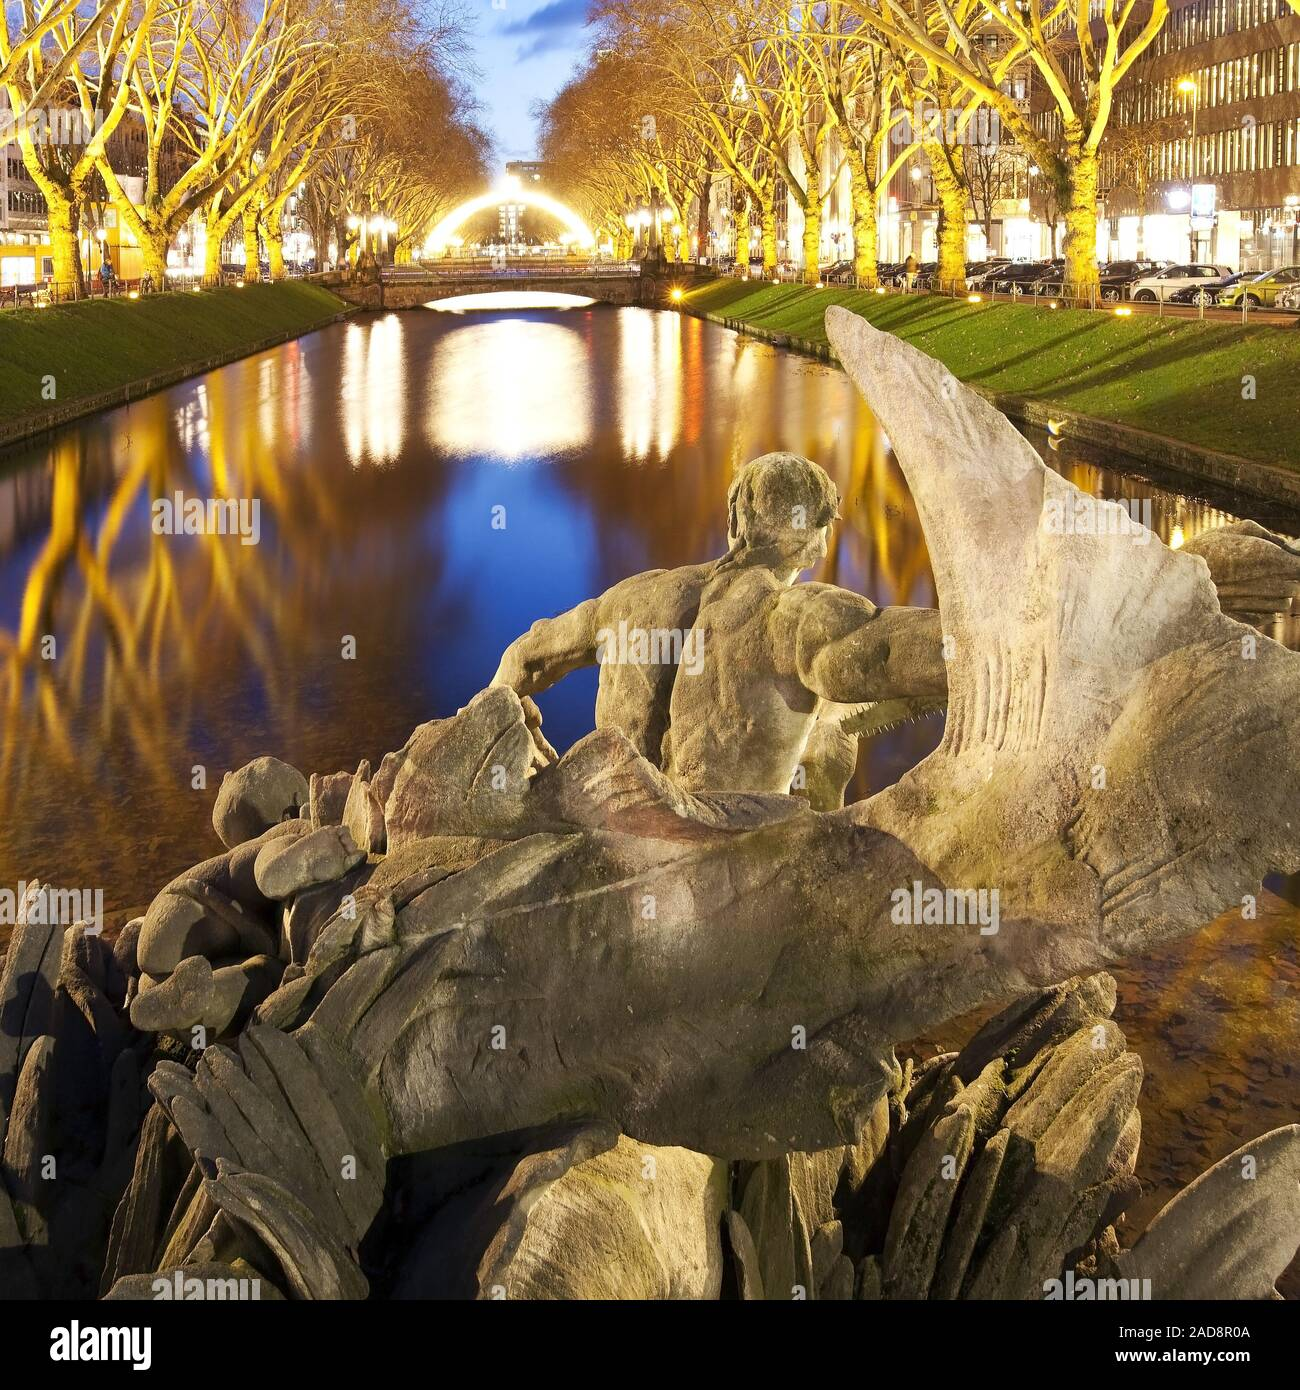 Triton fountain at Koenigsallee in the evening, Duesseldorf, North Rhine-Westphalia, Germany, Europe Stock Photo